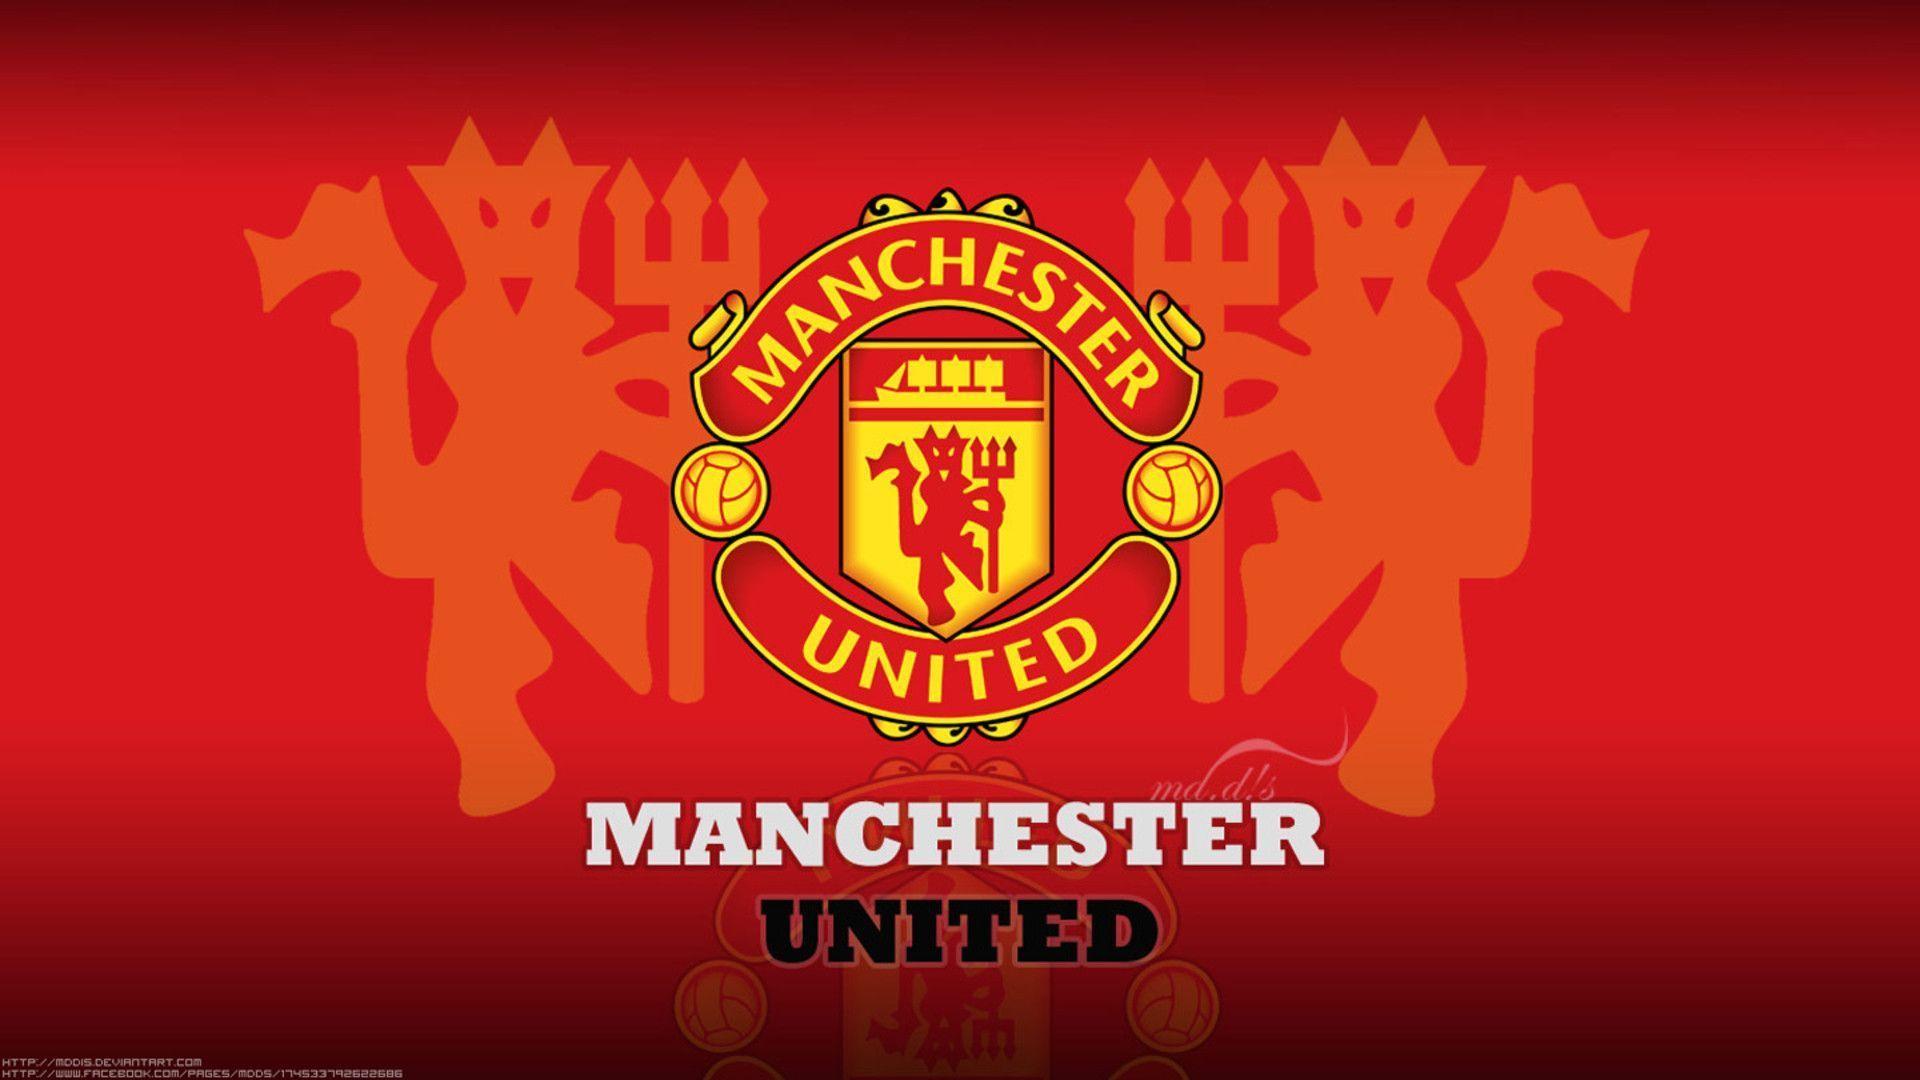 Manchester United Manchester United Logo Manchester United Wallpaper Manchester United Images